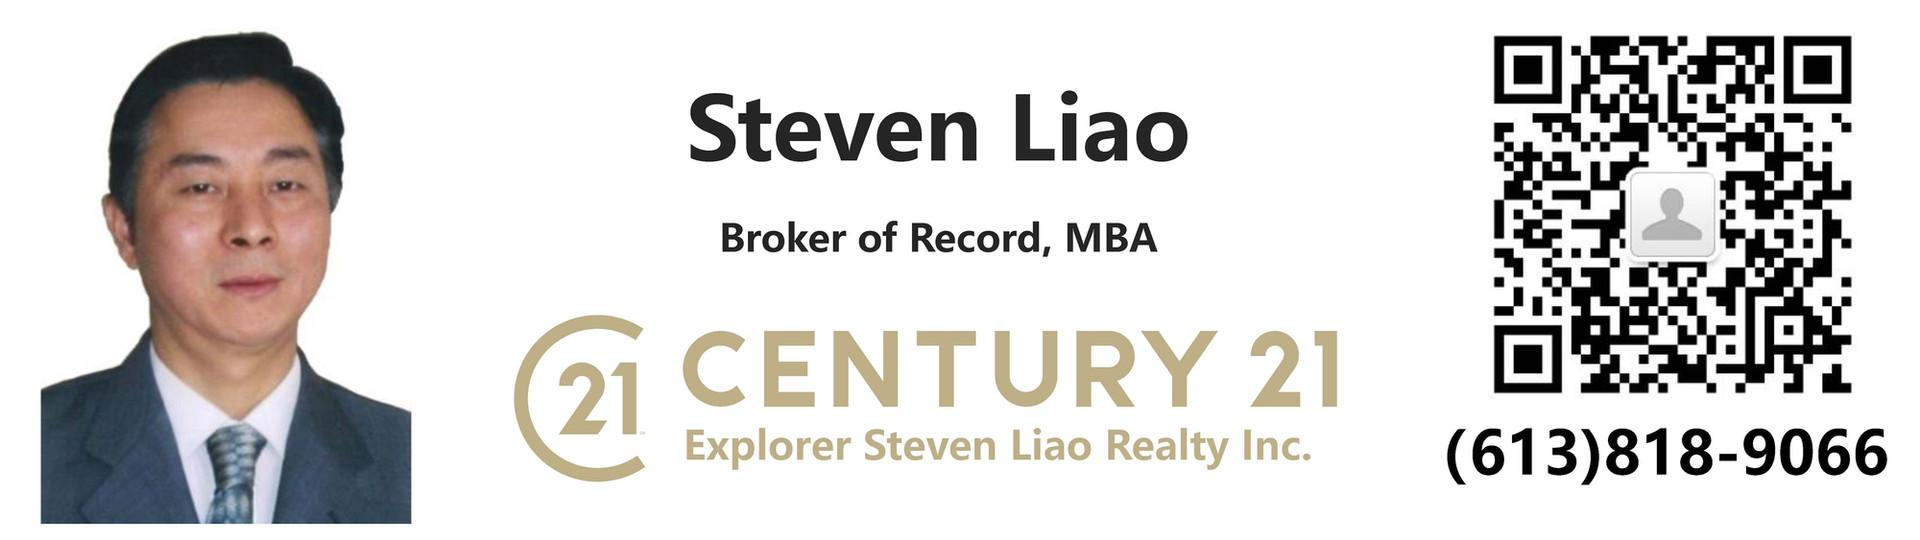 Steven Liao Banner.jpg